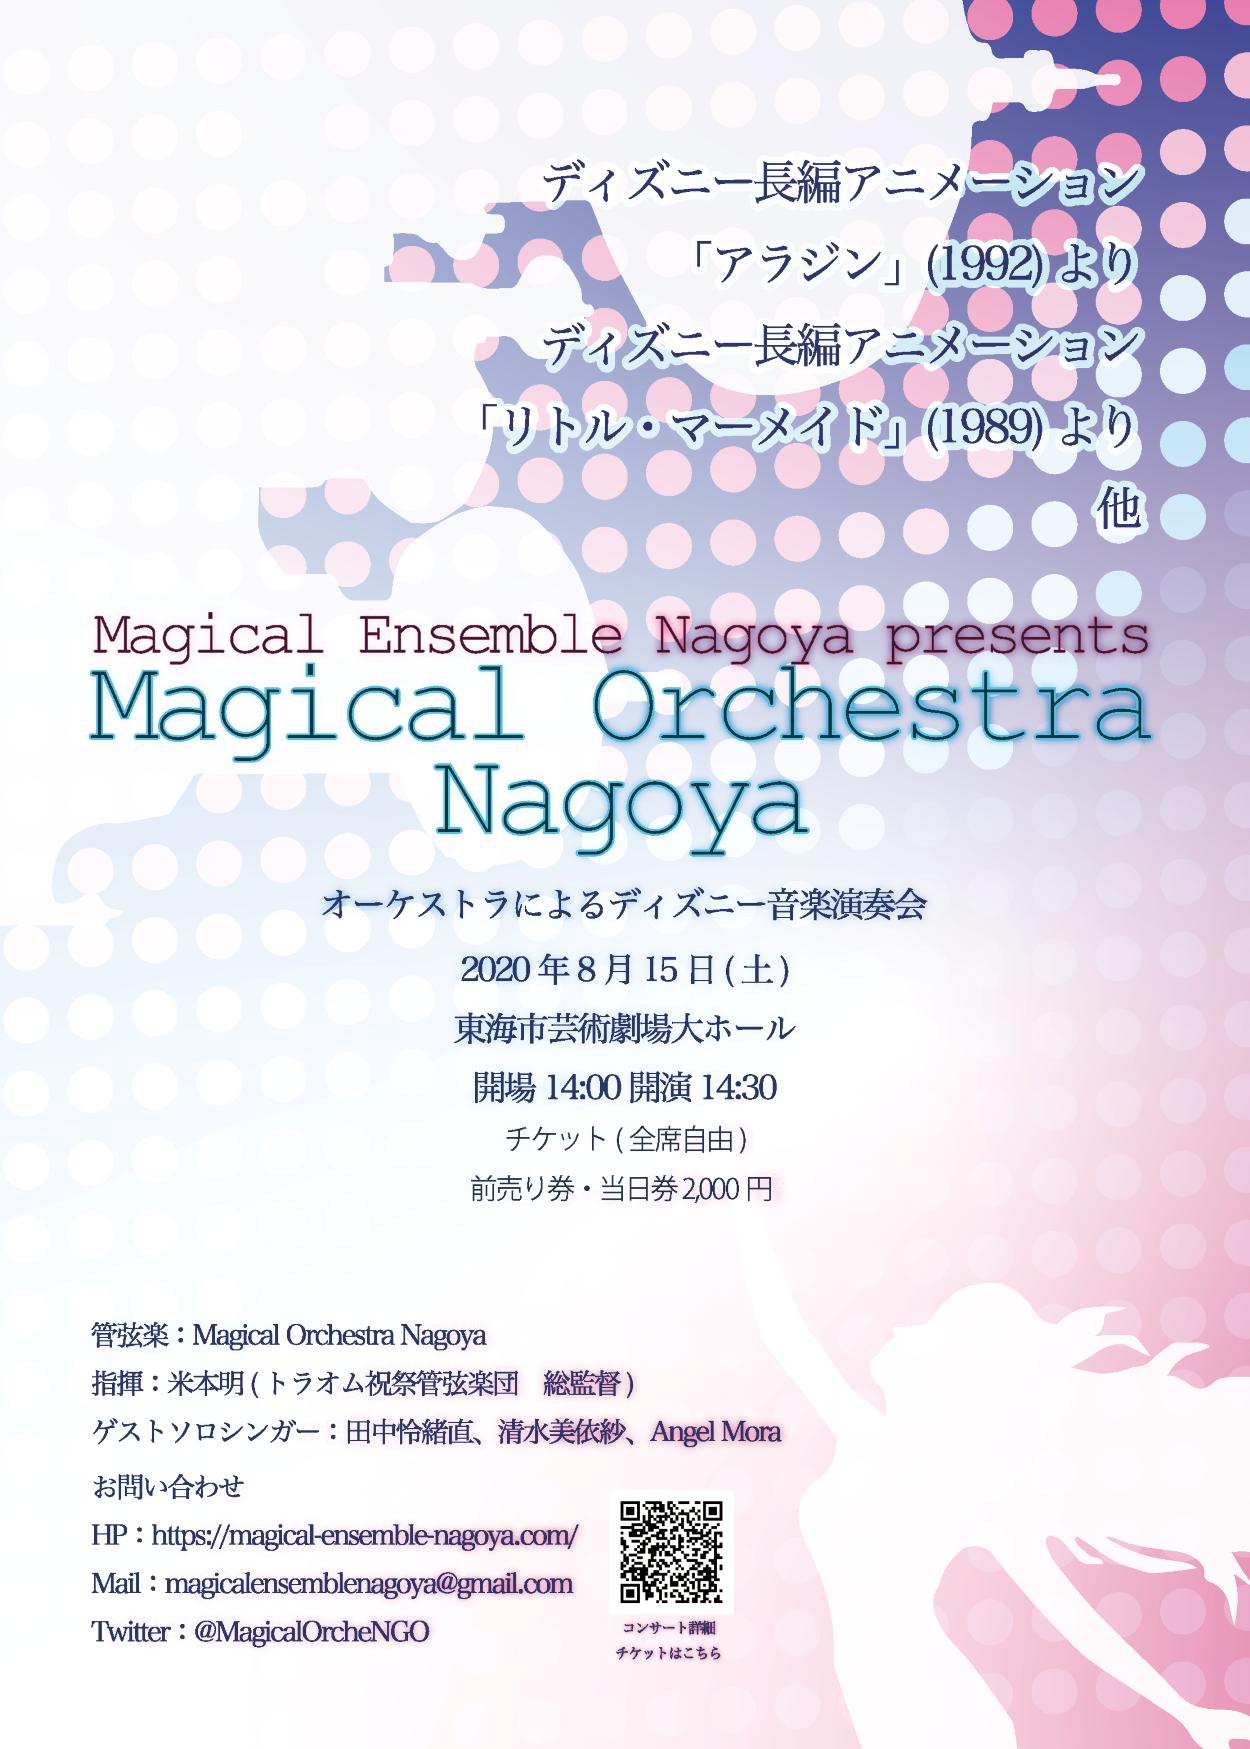 Magical Orchestra Nagoya 演奏会